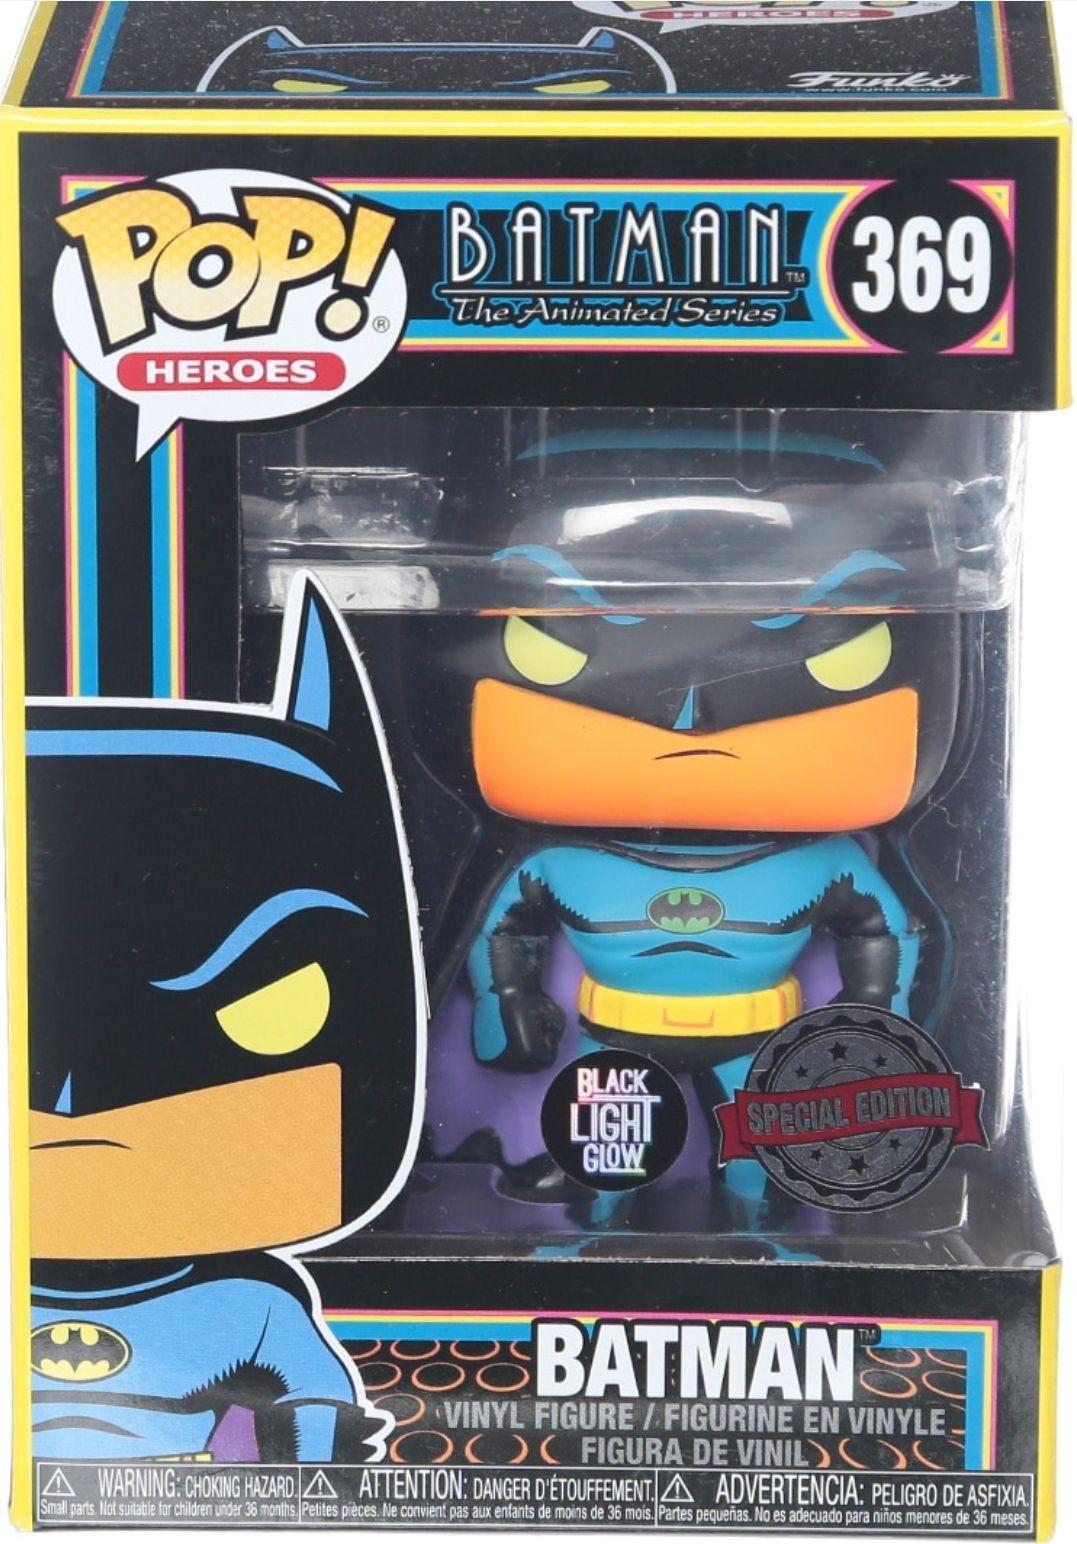 Liverpool: Funko pop Batman. Black Light Glow. Special Edition